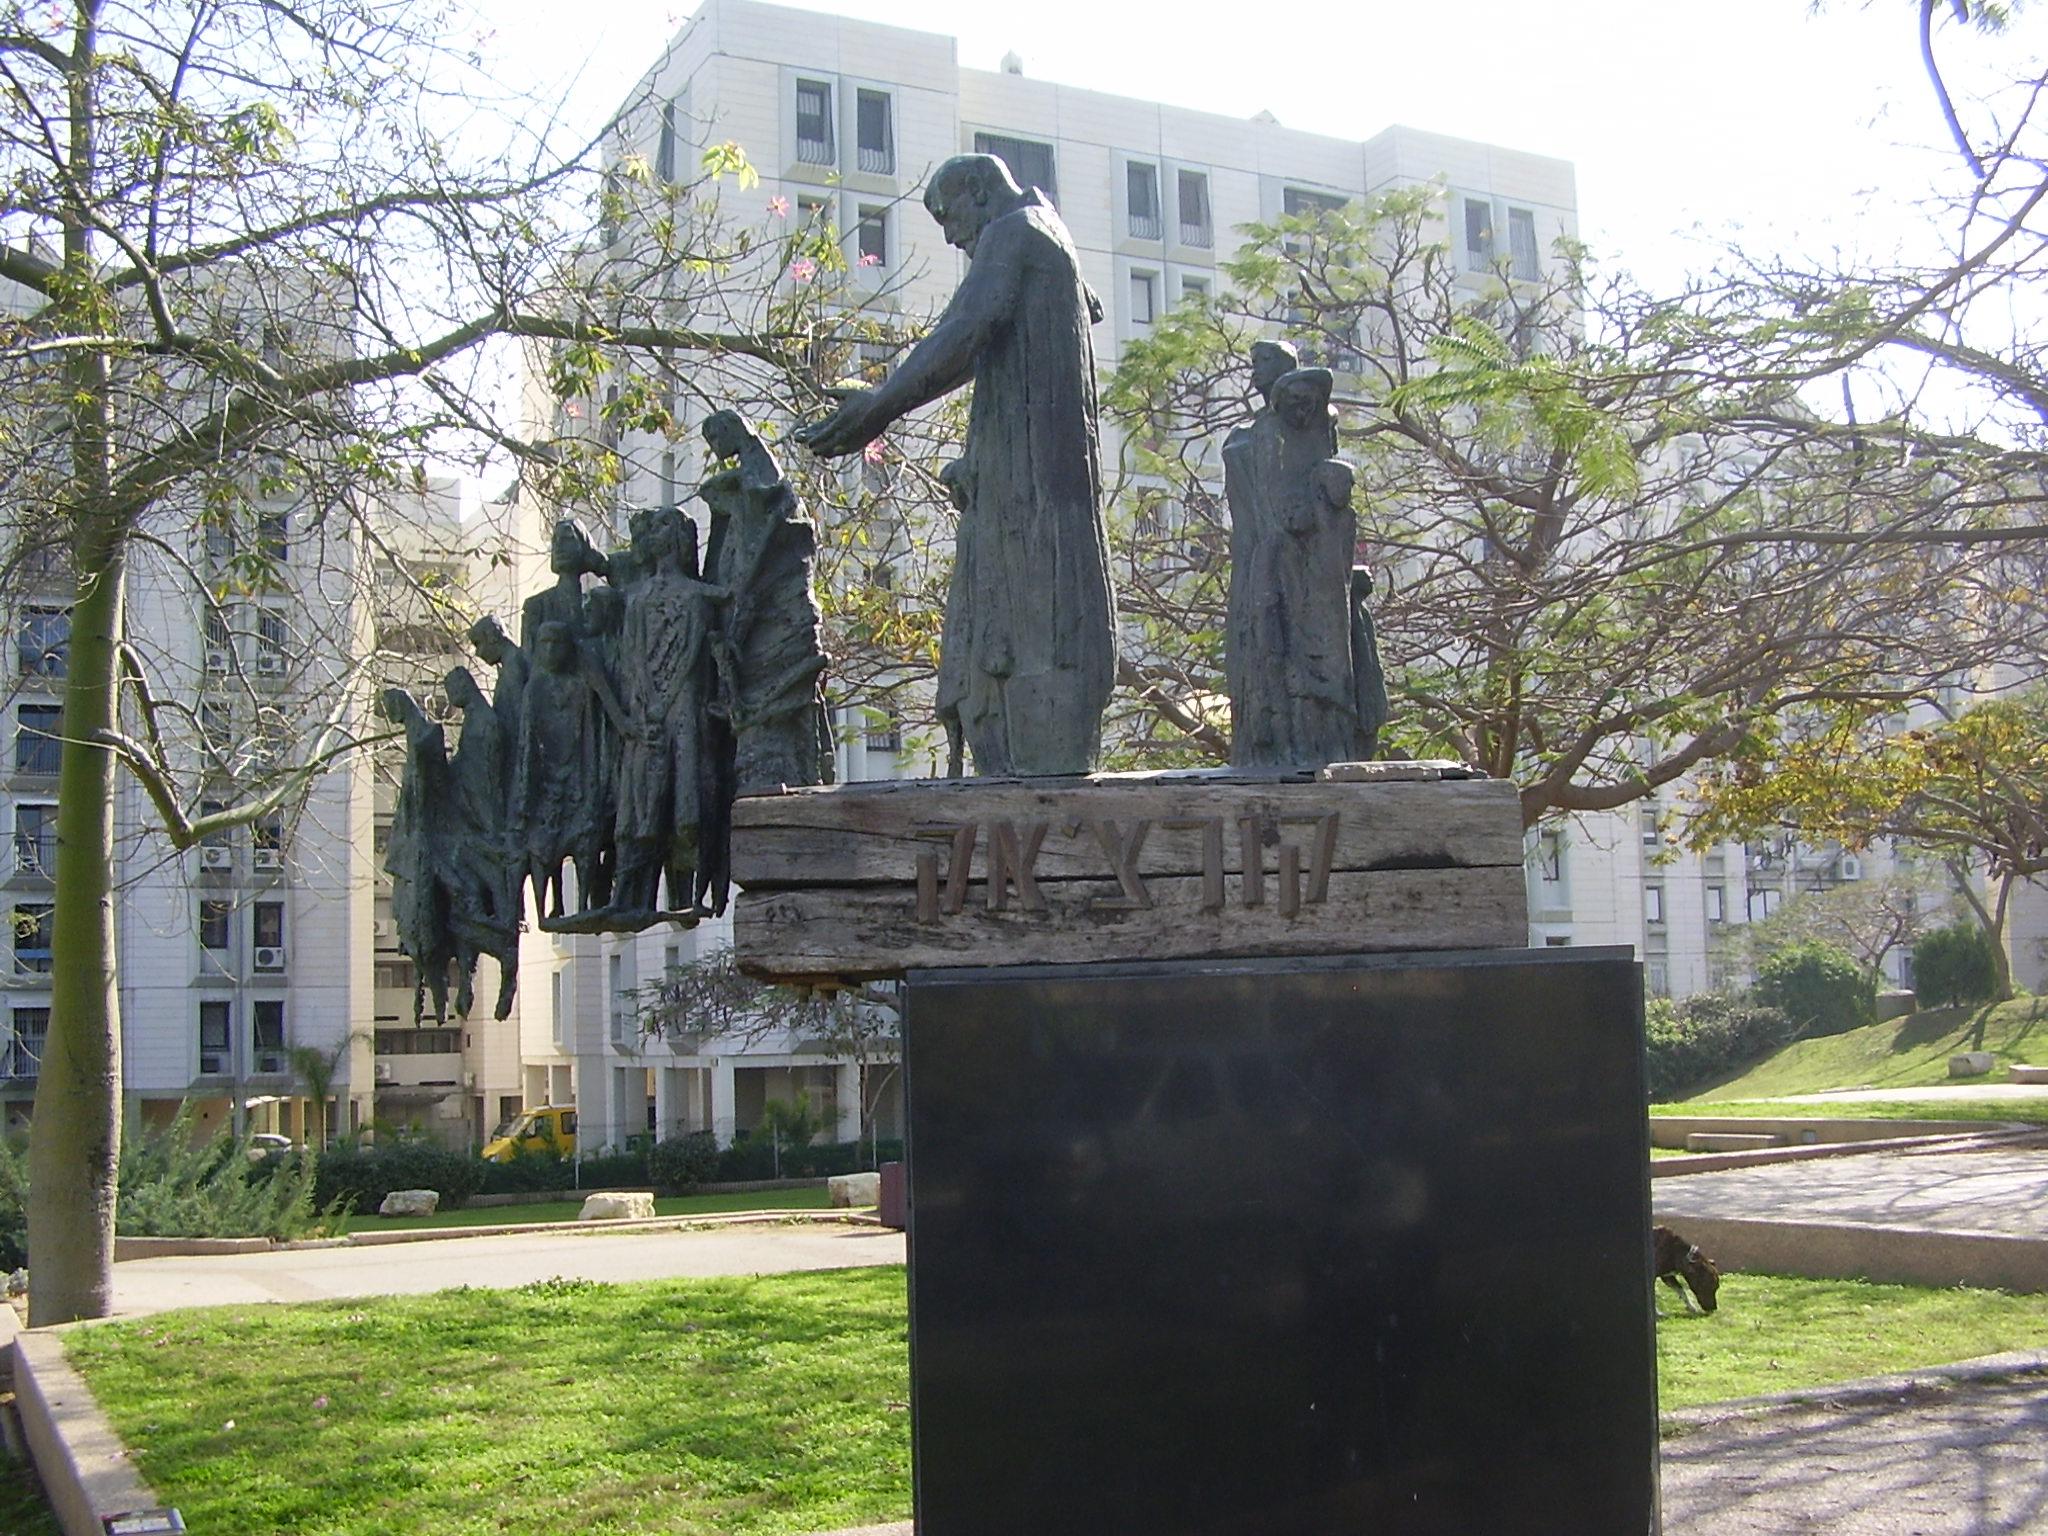 Statue i spomenici posvećene deci PikiWiki_Israel_11691_monument_to_janusz_korczak_and_the_children_in_bat